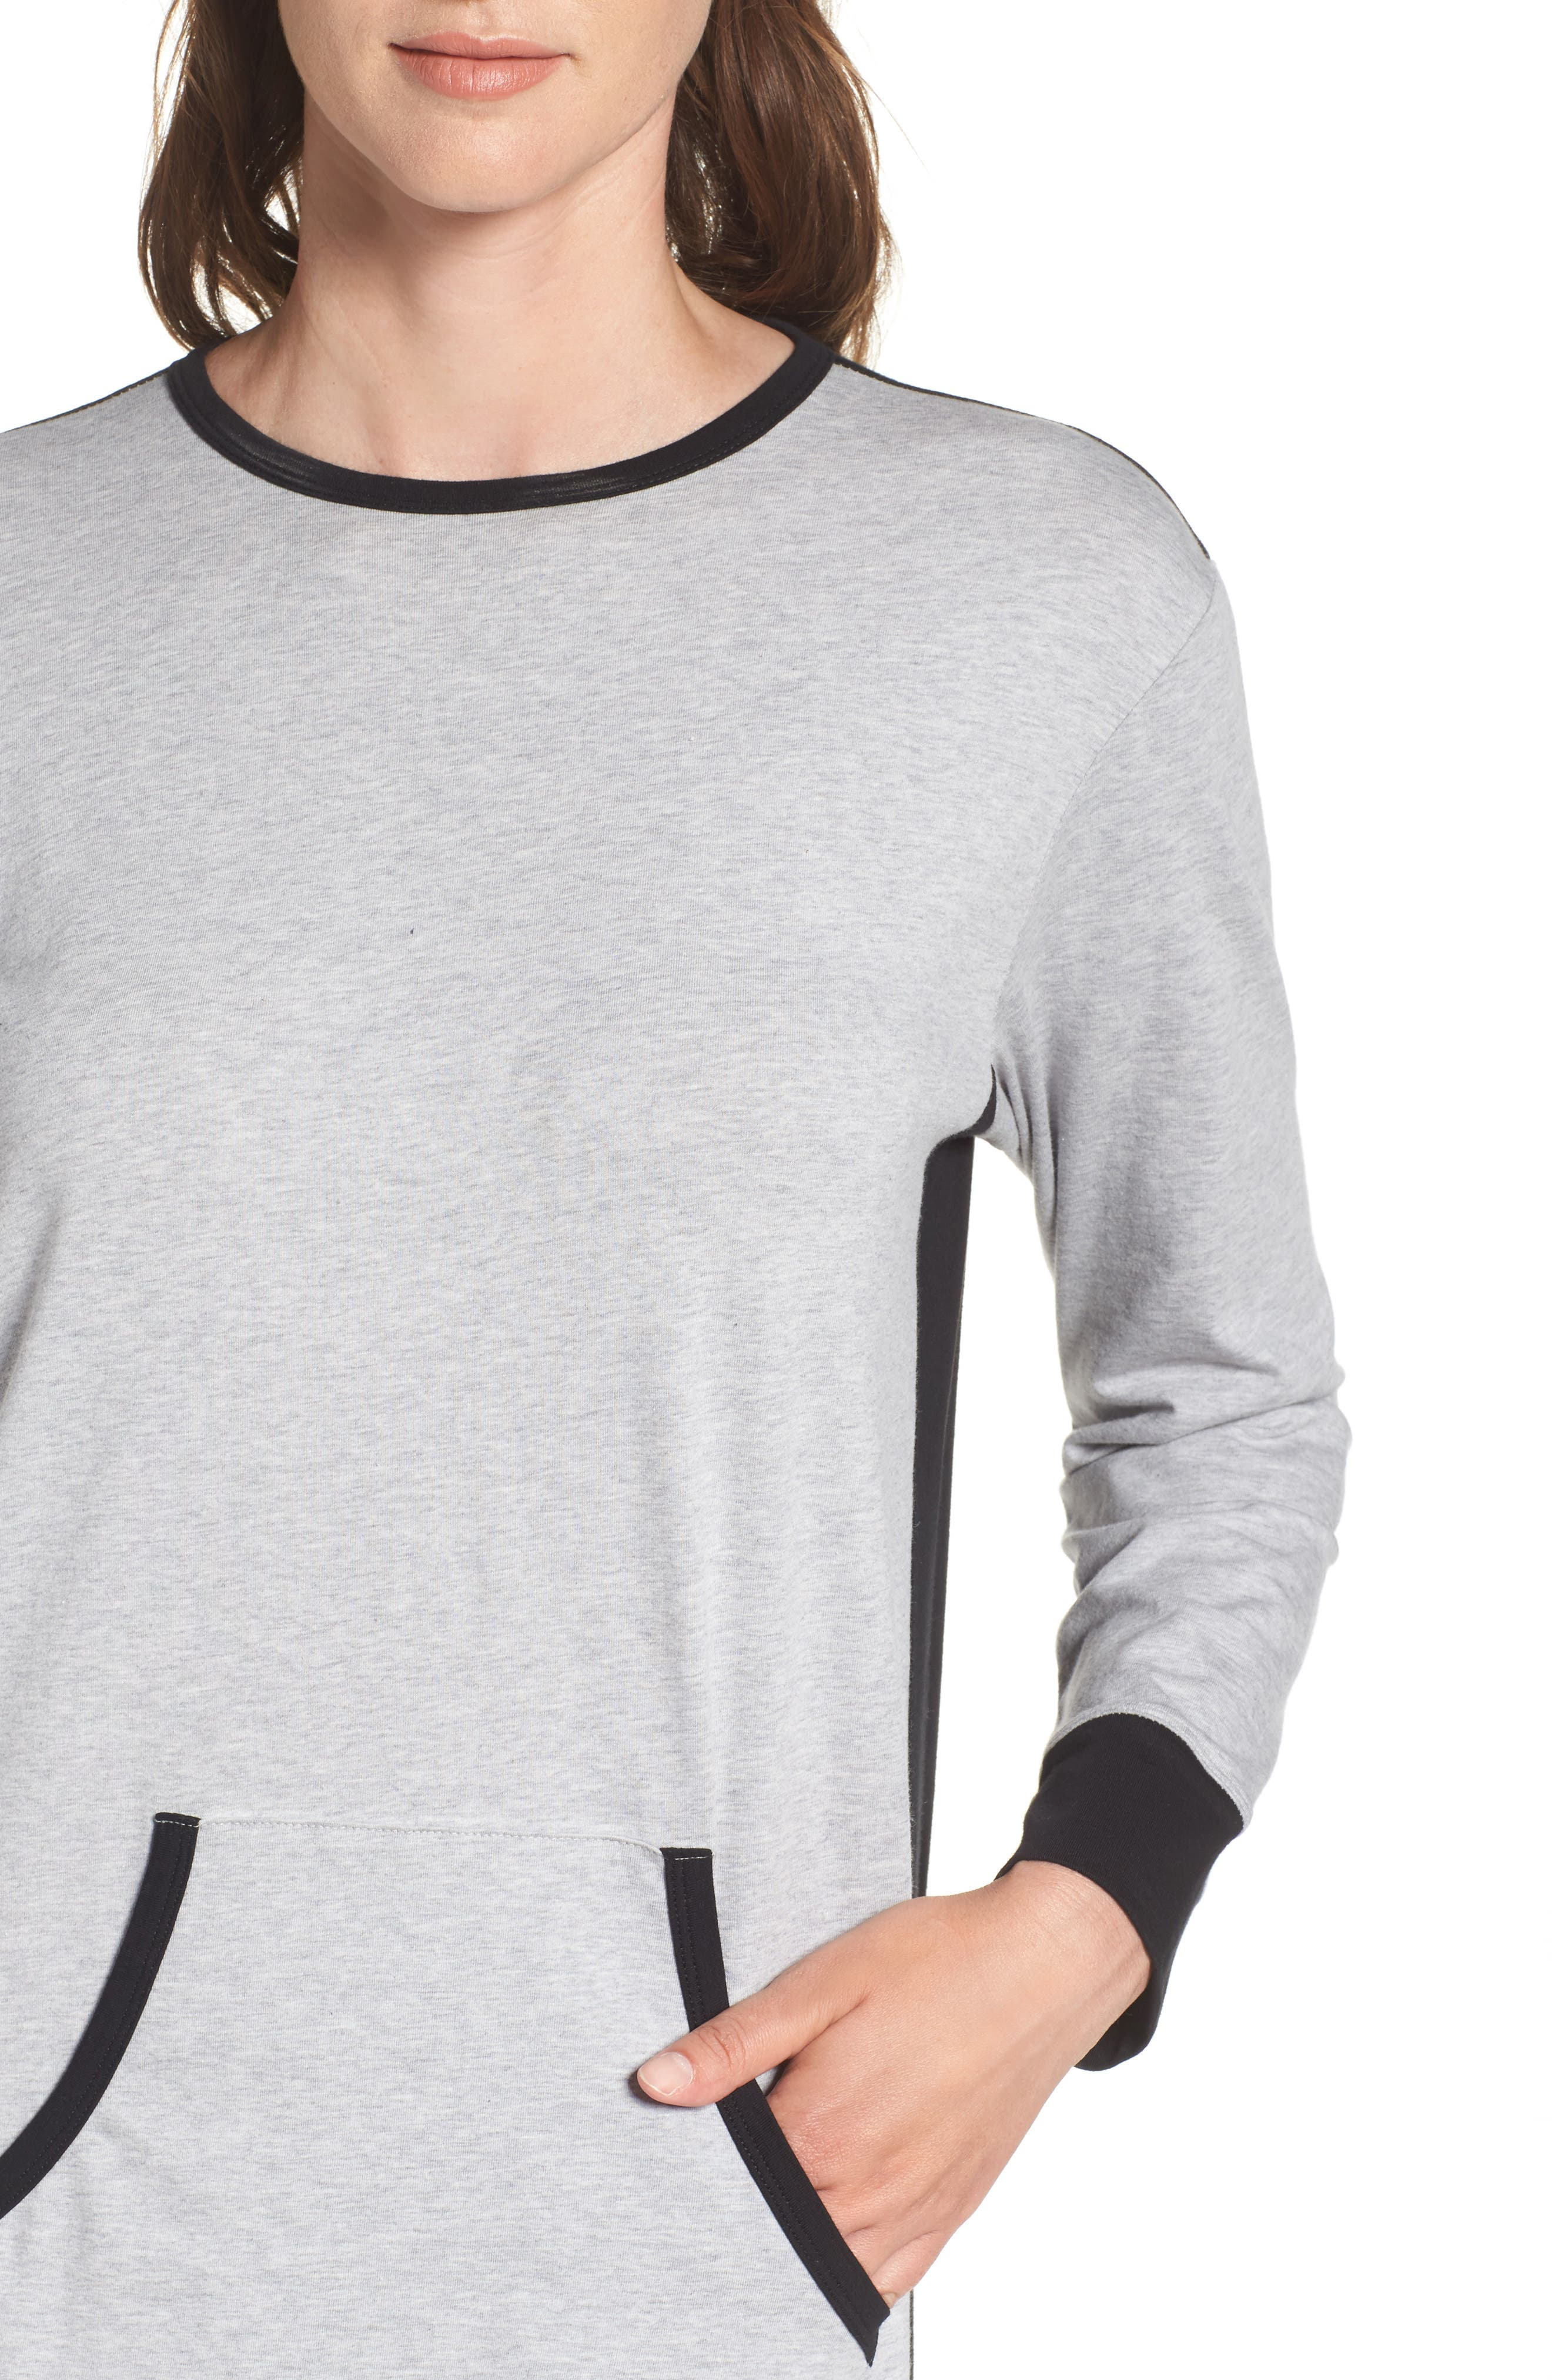 Lounger Sleep Shirt,                             Alternate thumbnail 8, color,